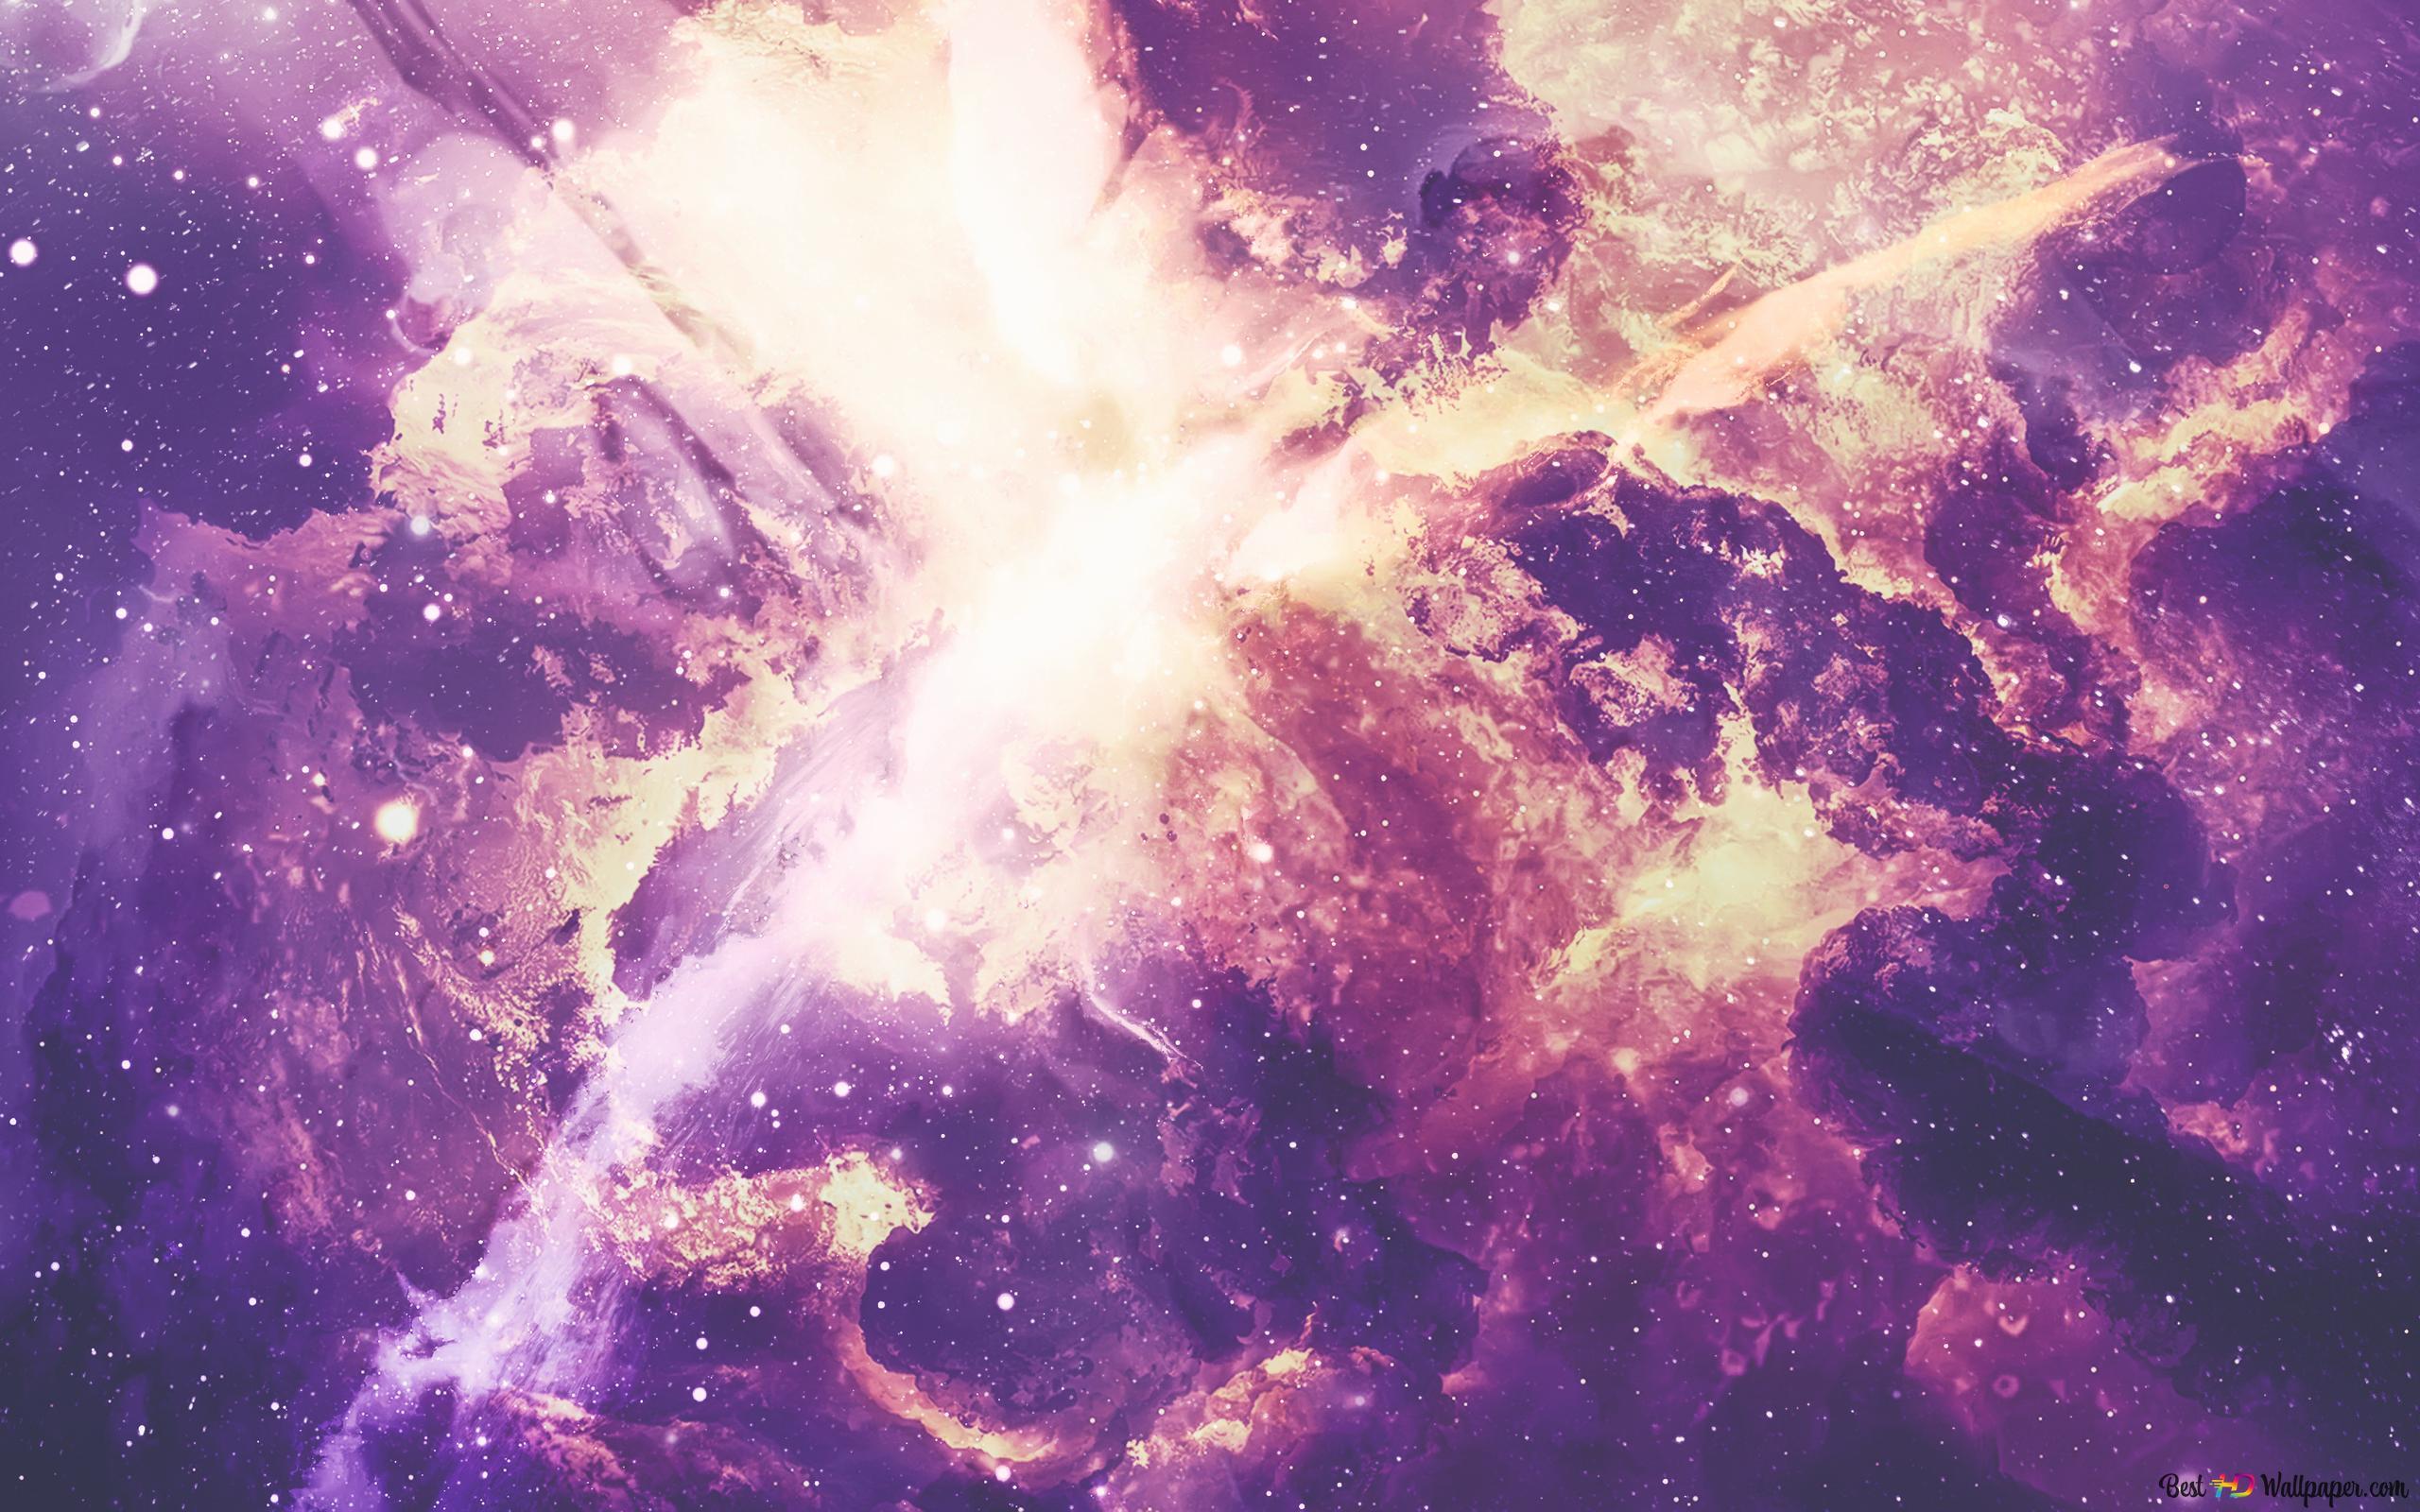 Interstellar HD wallpaper download